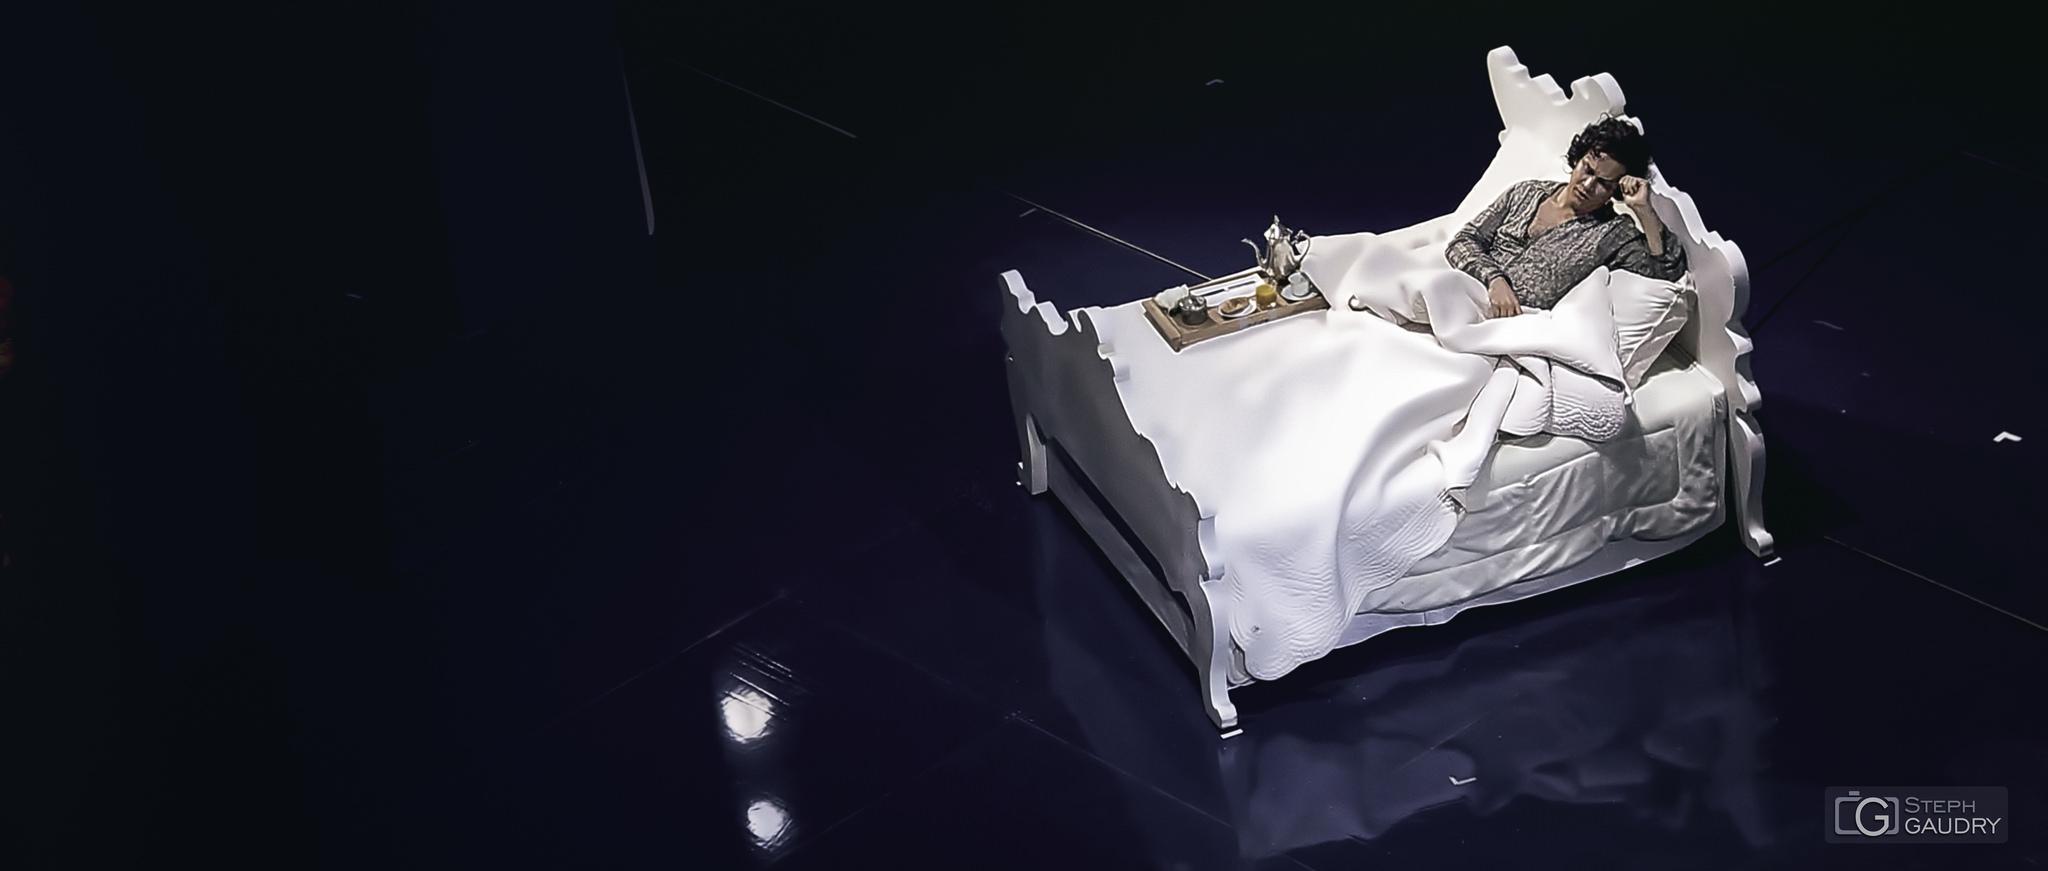 La traviata - Alfredo (Javier Tomé Fernández) [Click to start slideshow]